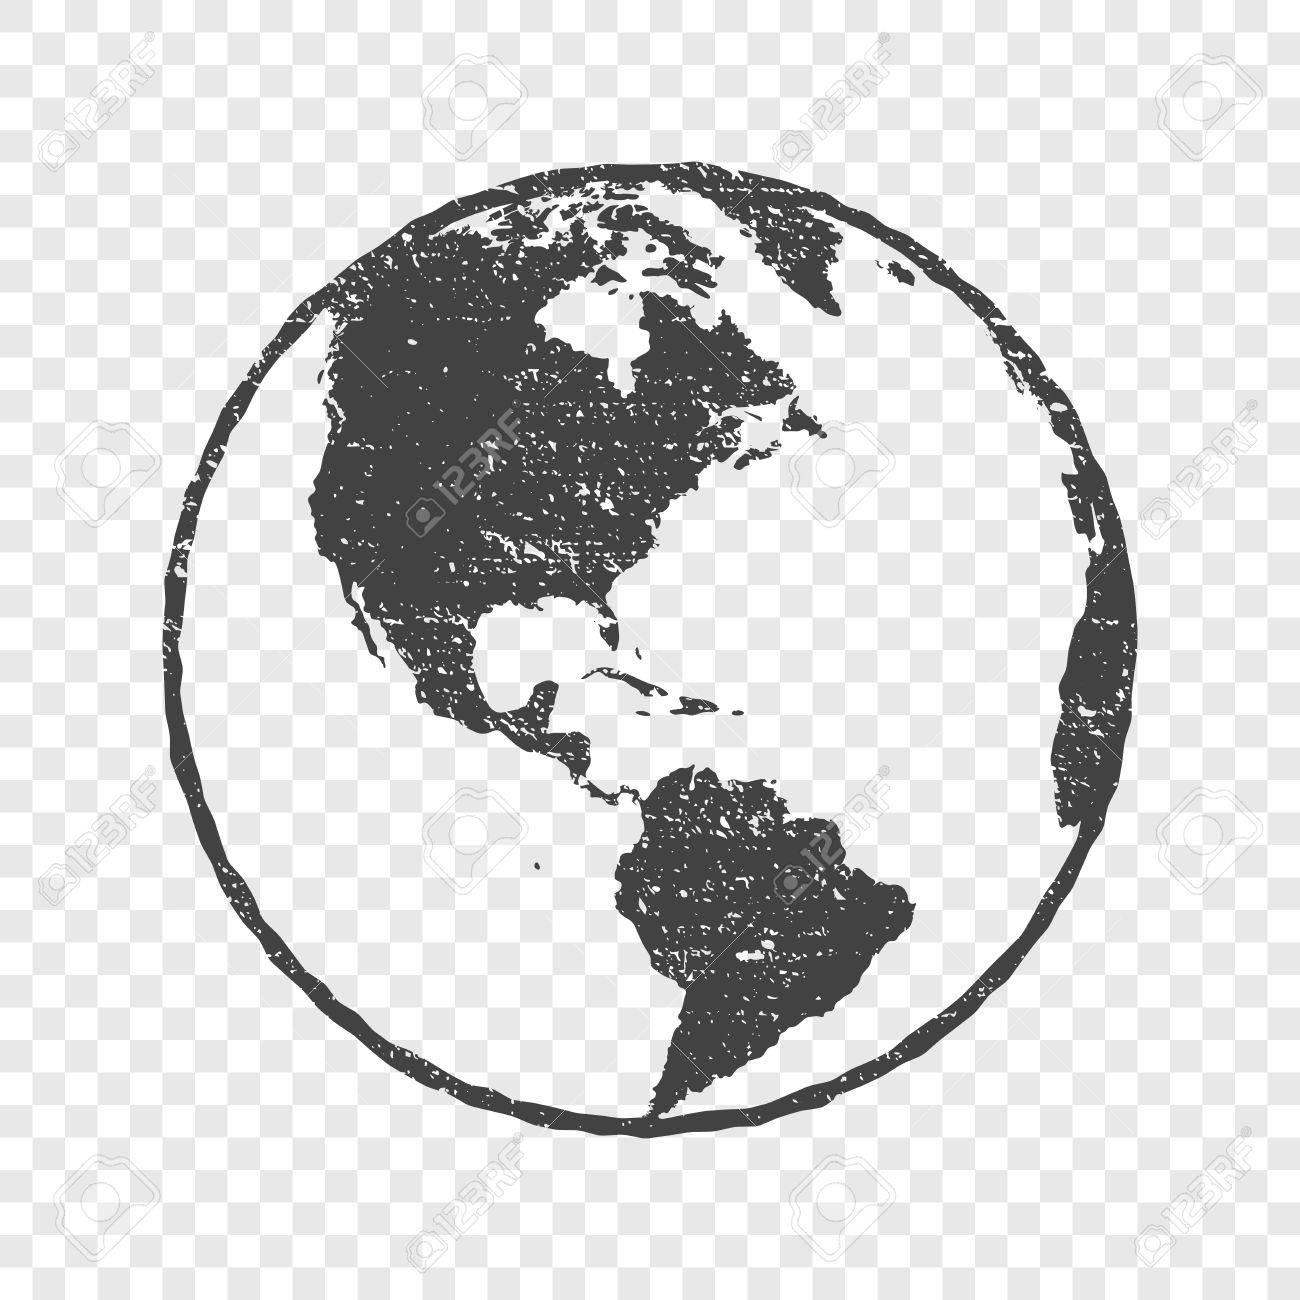 Grunge texture gray world map transparent vector illustration grunge texture gray world map transparent vector illustration stock vector 76835242 gumiabroncs Images